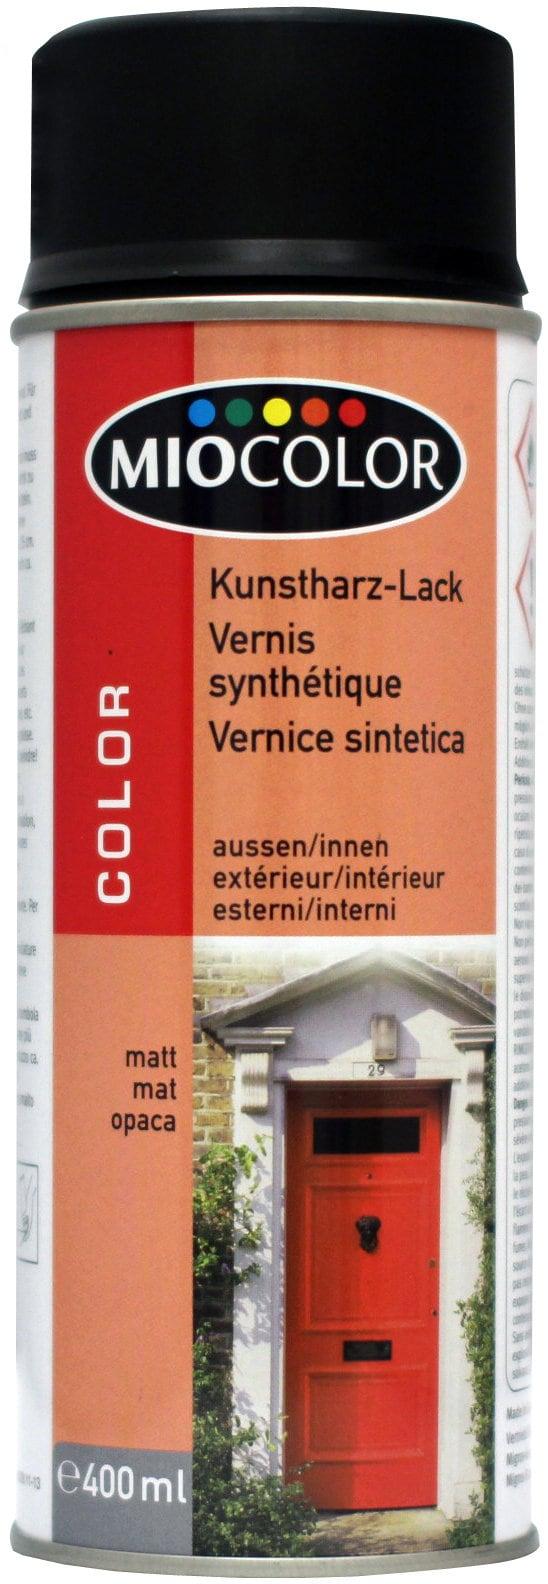 Miocolor Vernice spray a base di resina sintetica opaco